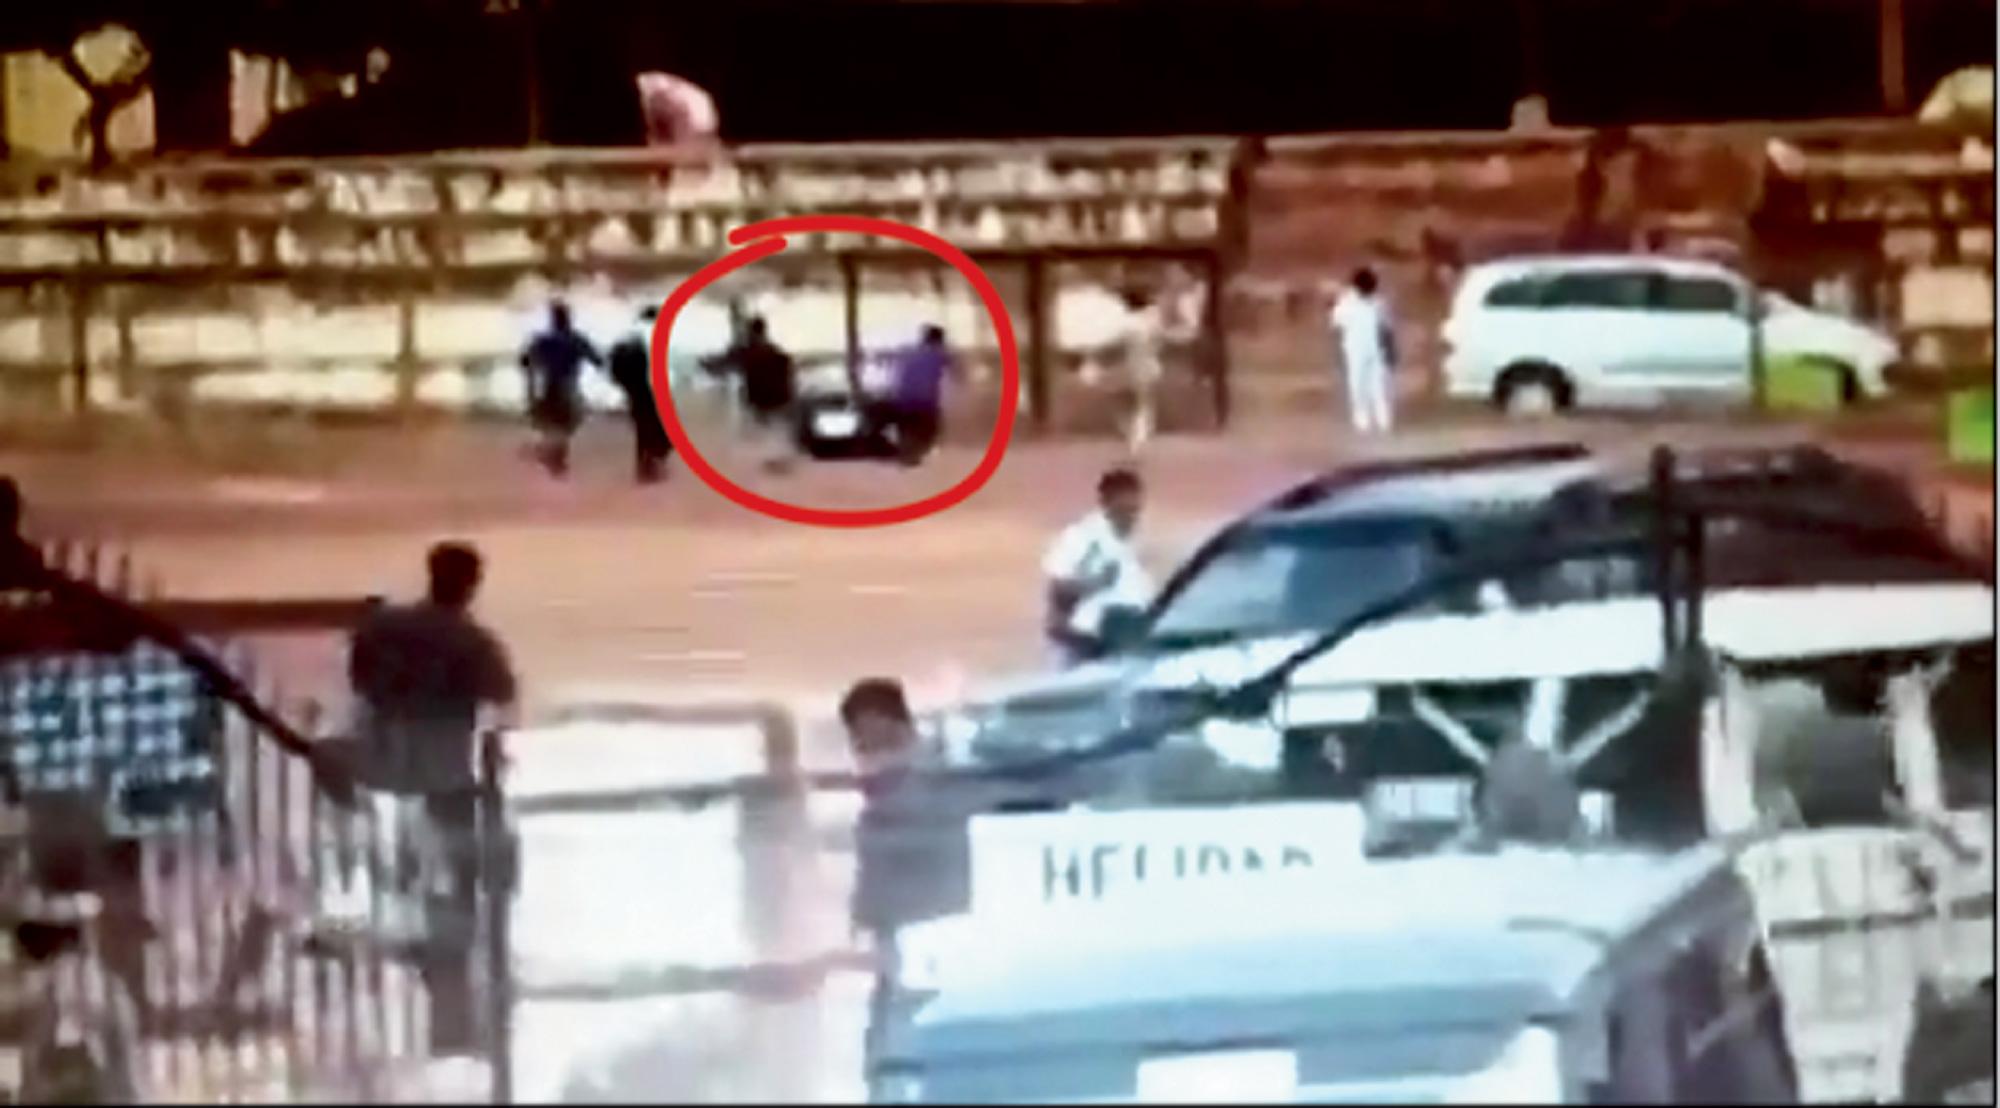 Mystery box on Karnataka helipad